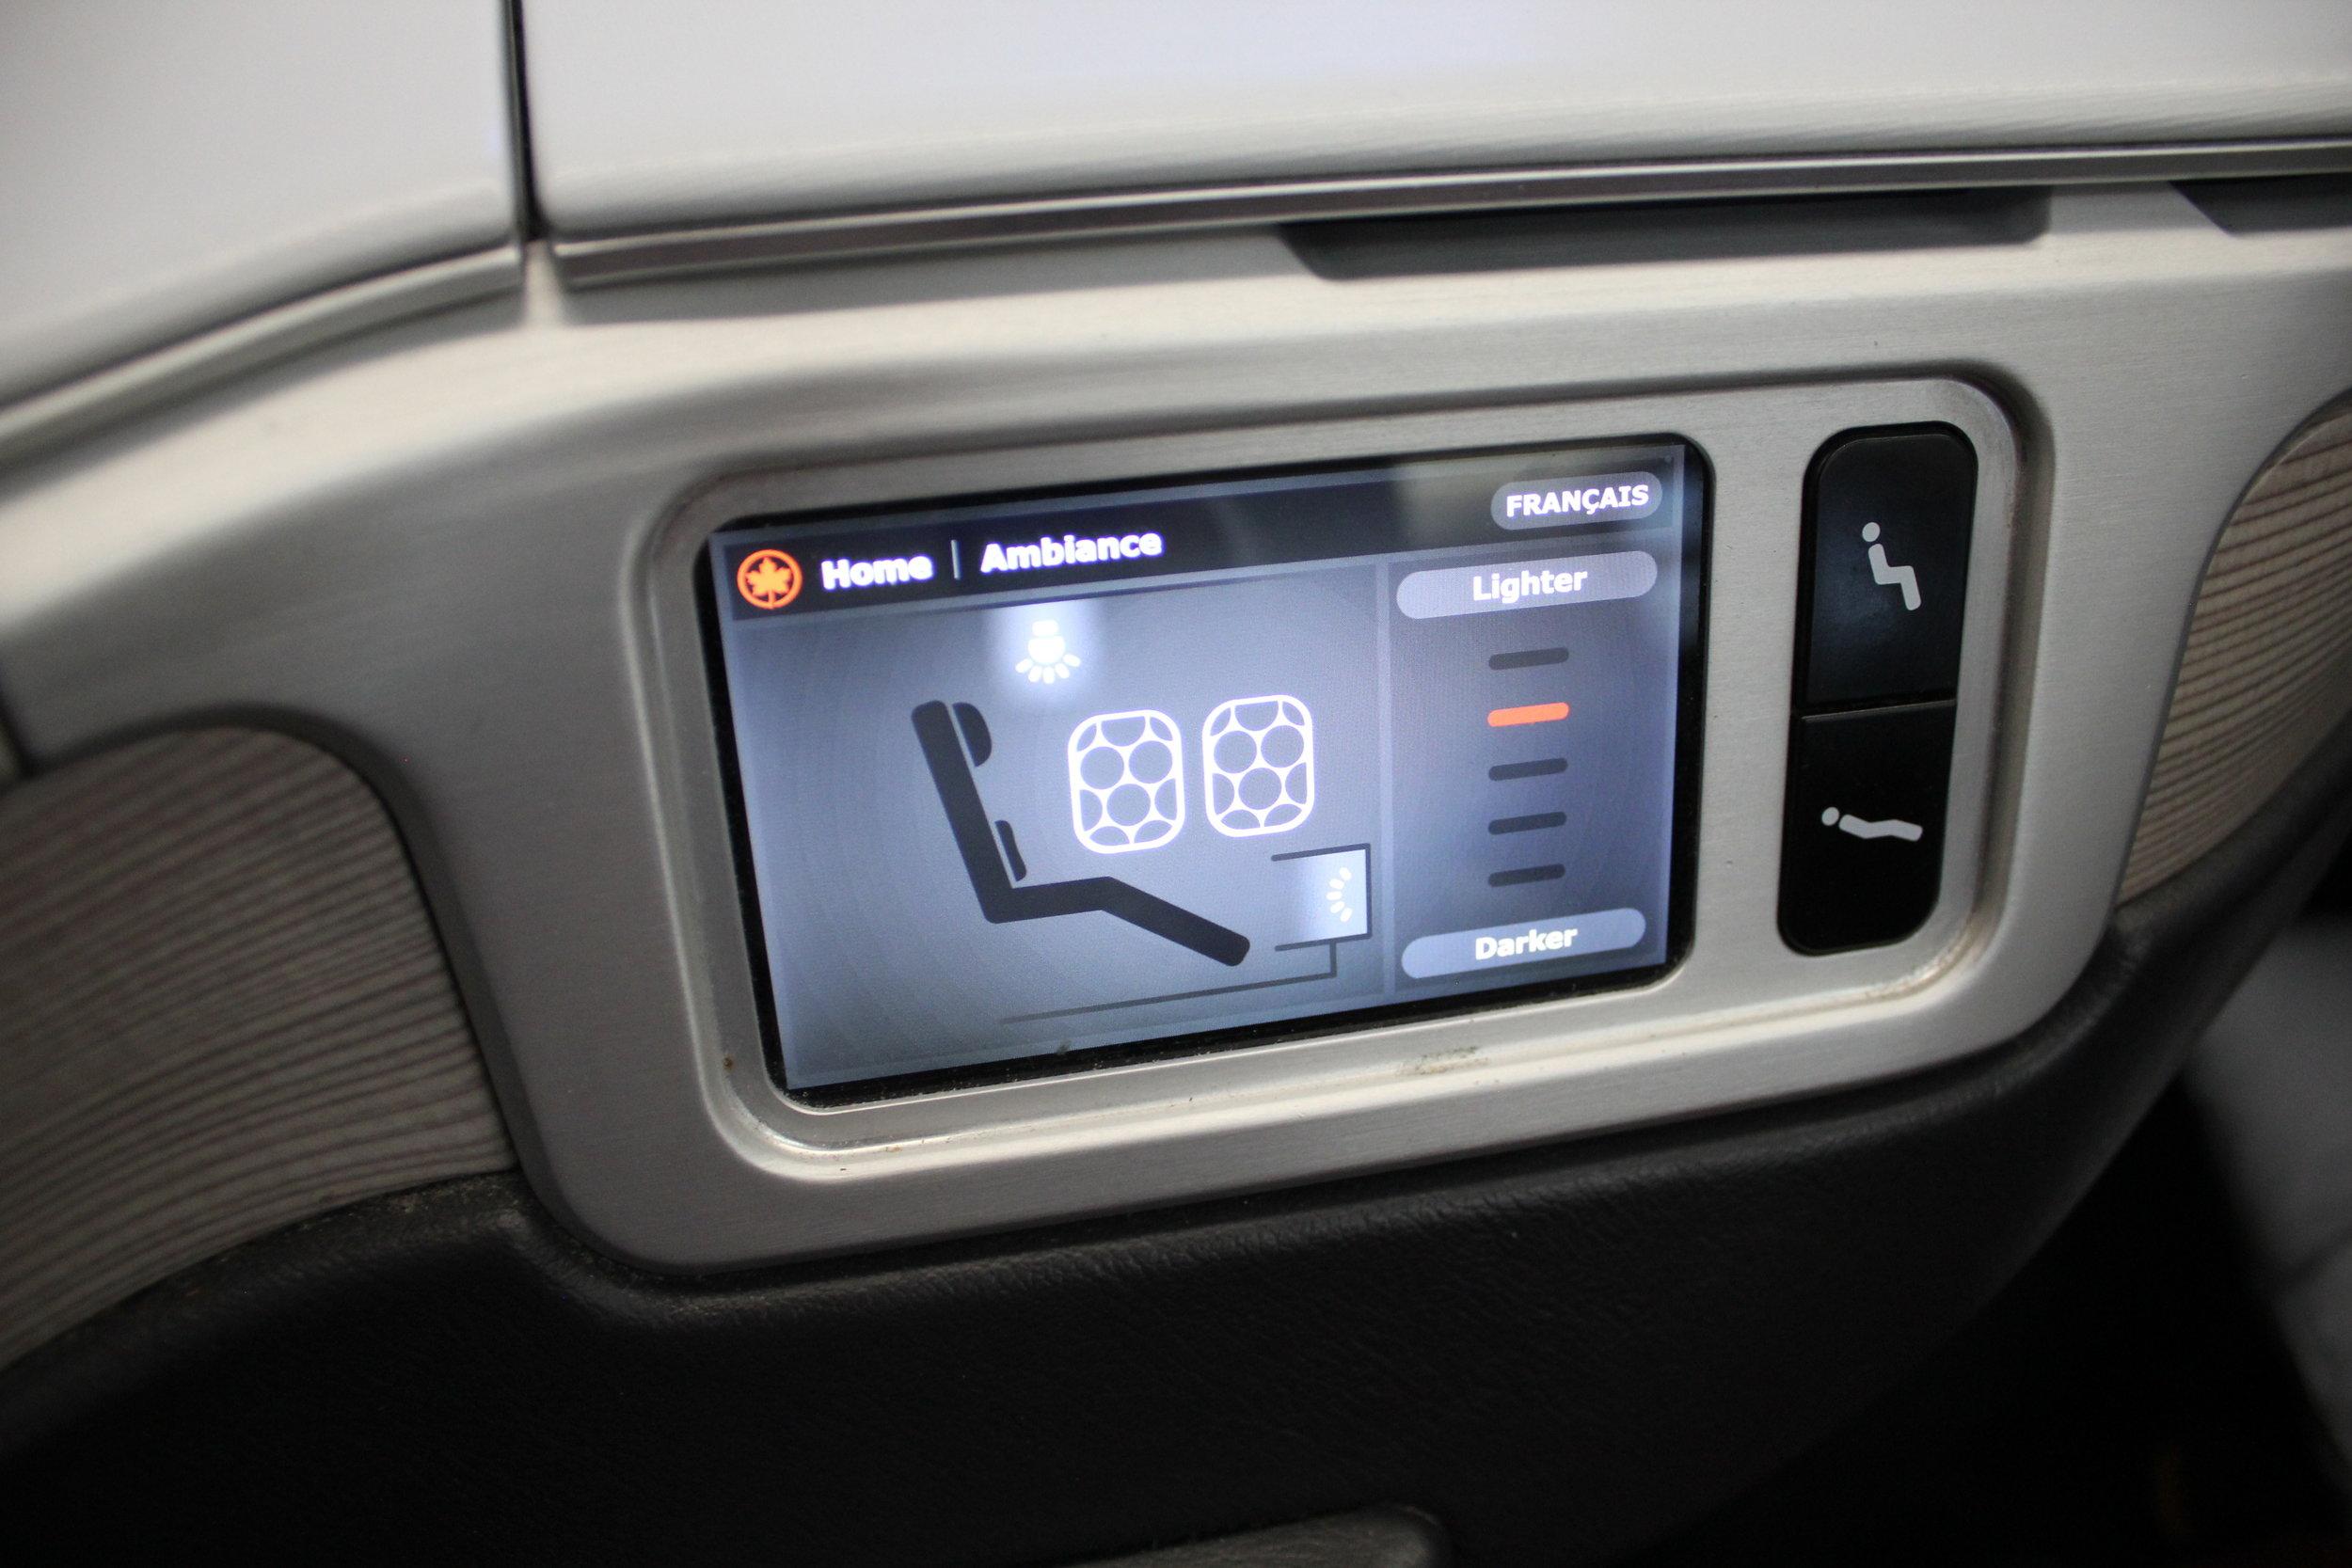 Air Canada business class – Window switch via seat controls